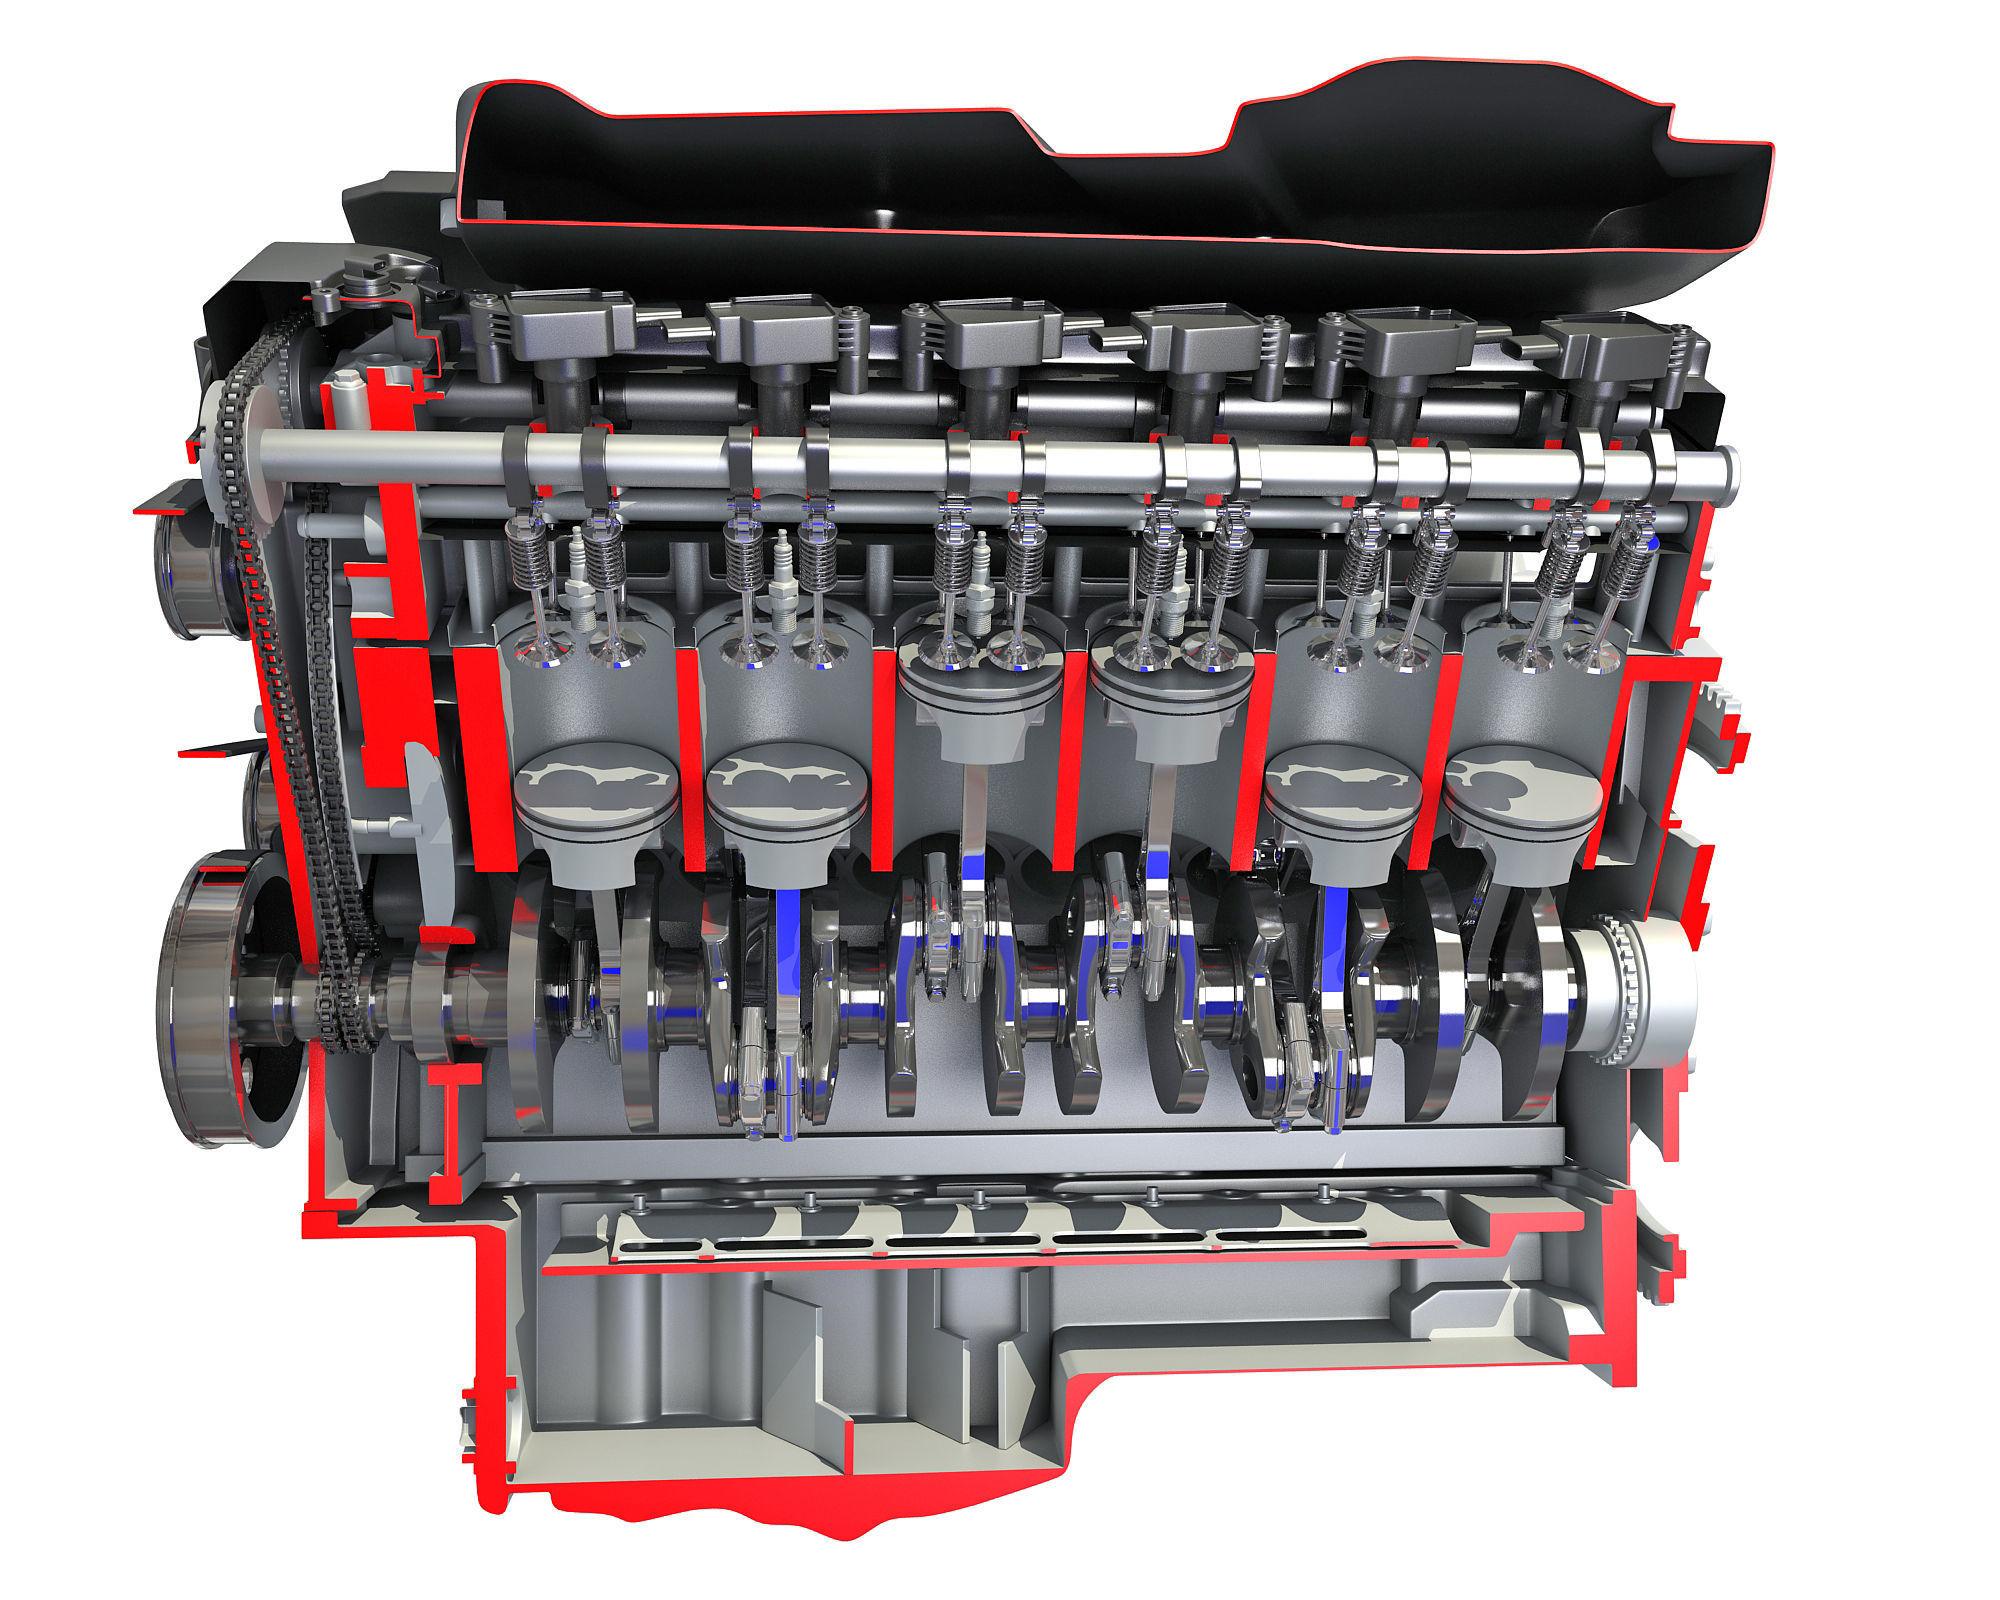 Animated Cutaway V12 Engine